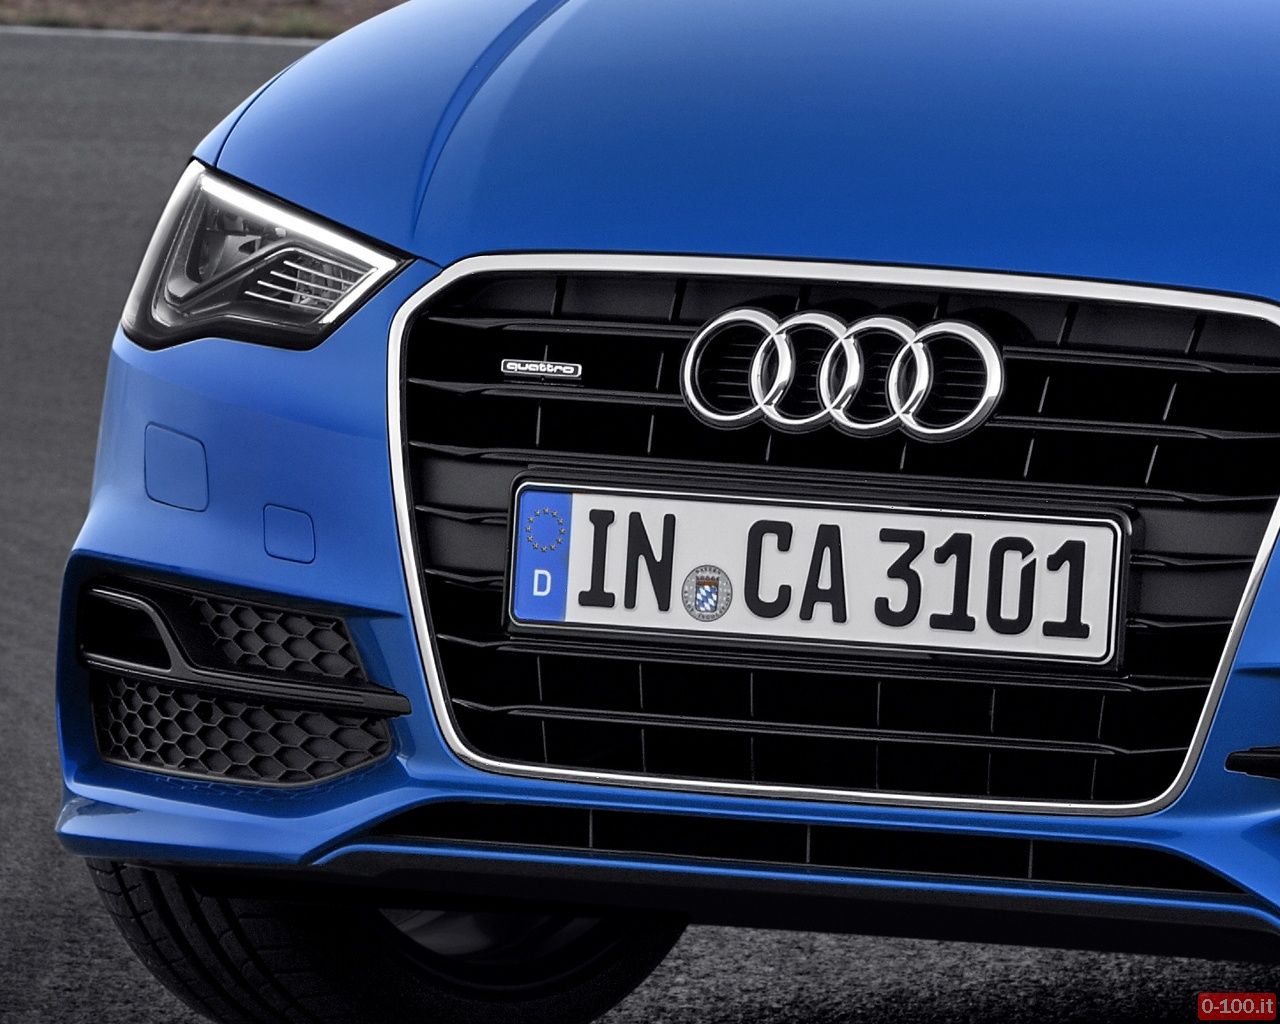 Audi A3 Cabriolet 2.0 TFSI quattro